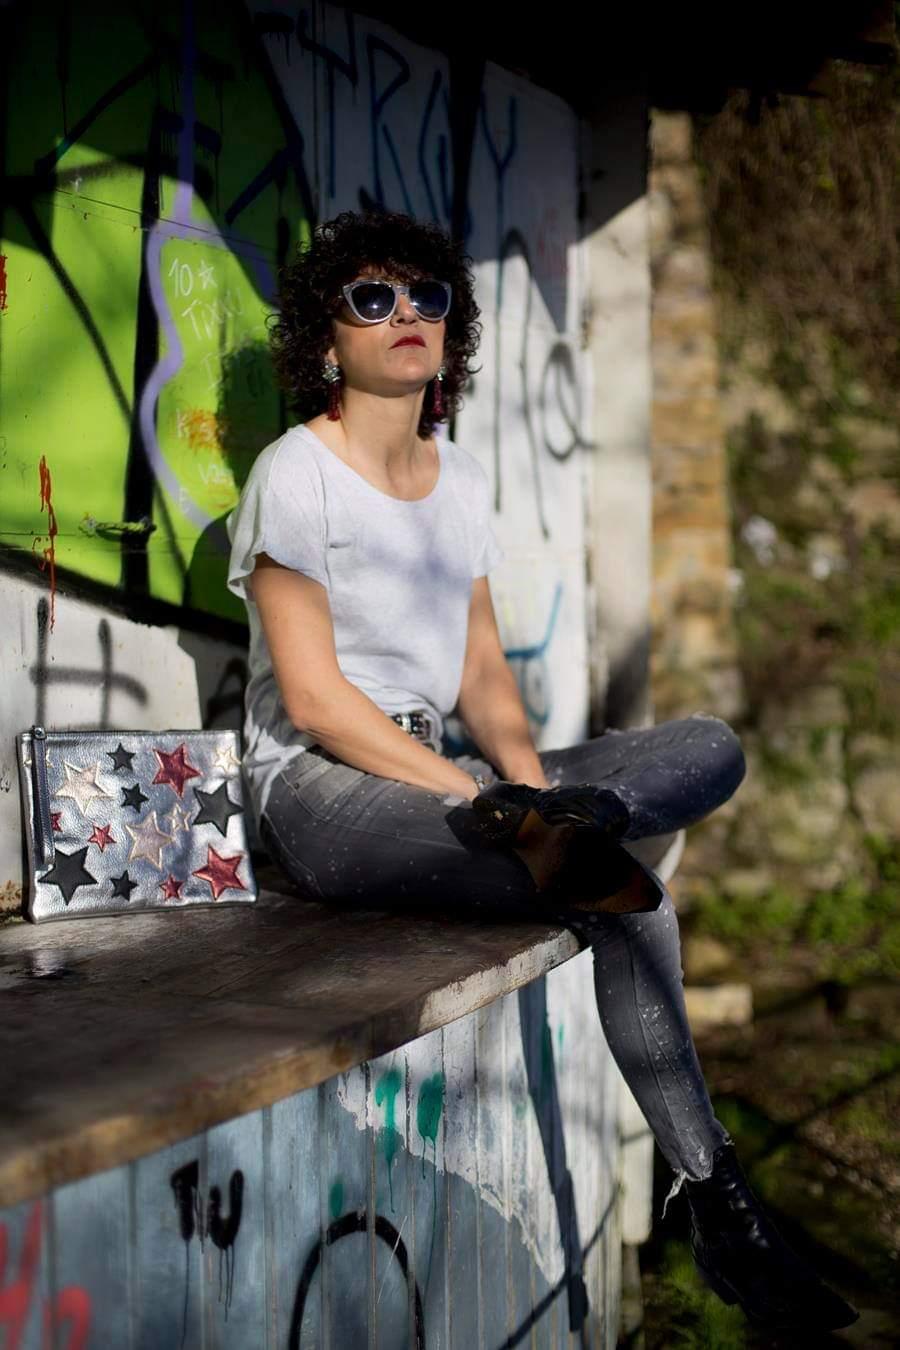 Rebeca Valdivia, asesora de imagen, personal shopper, estilista, stilist, influencer, Donostia, San Sebastián, Miss Clov, la blogger indie, influencer, cowgirl, Jeans, Denim